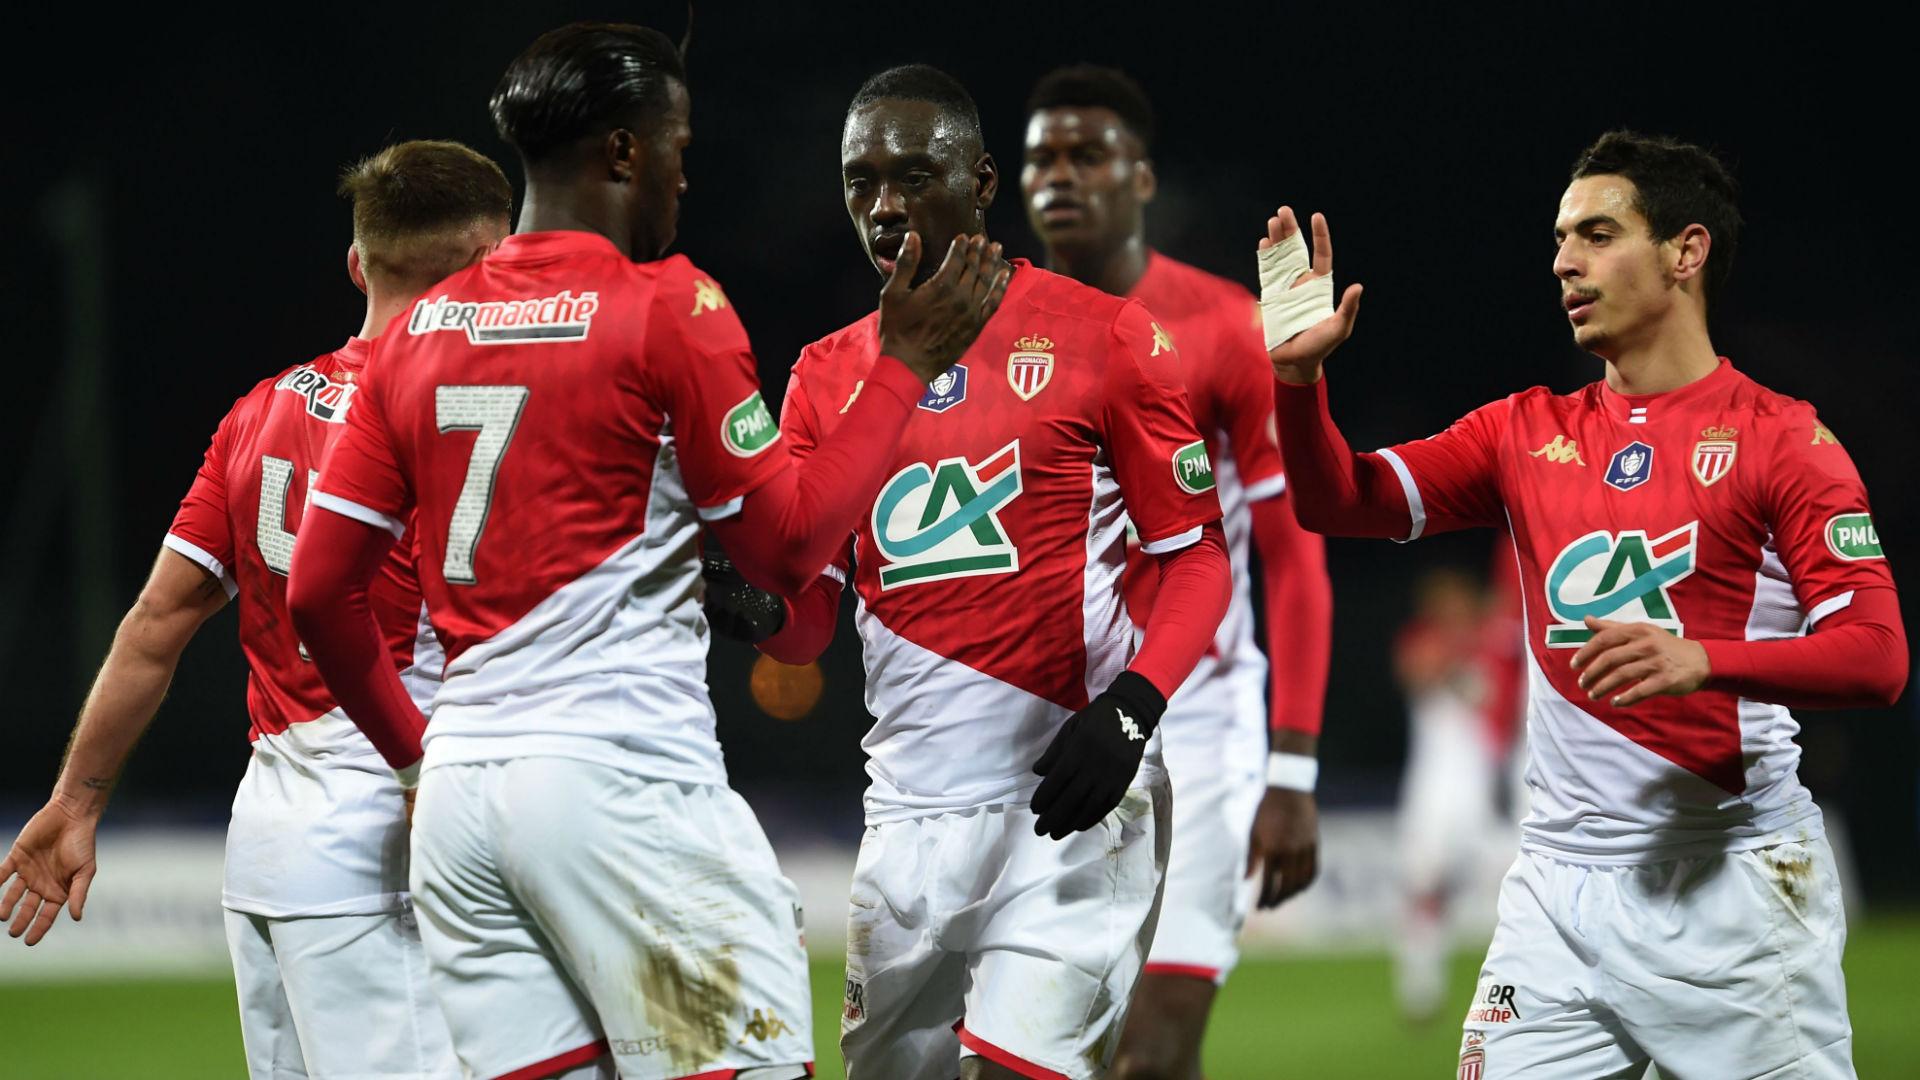 French Cup: Keita Balde's brace powers Monaco past St-Pryve St-Hilaire